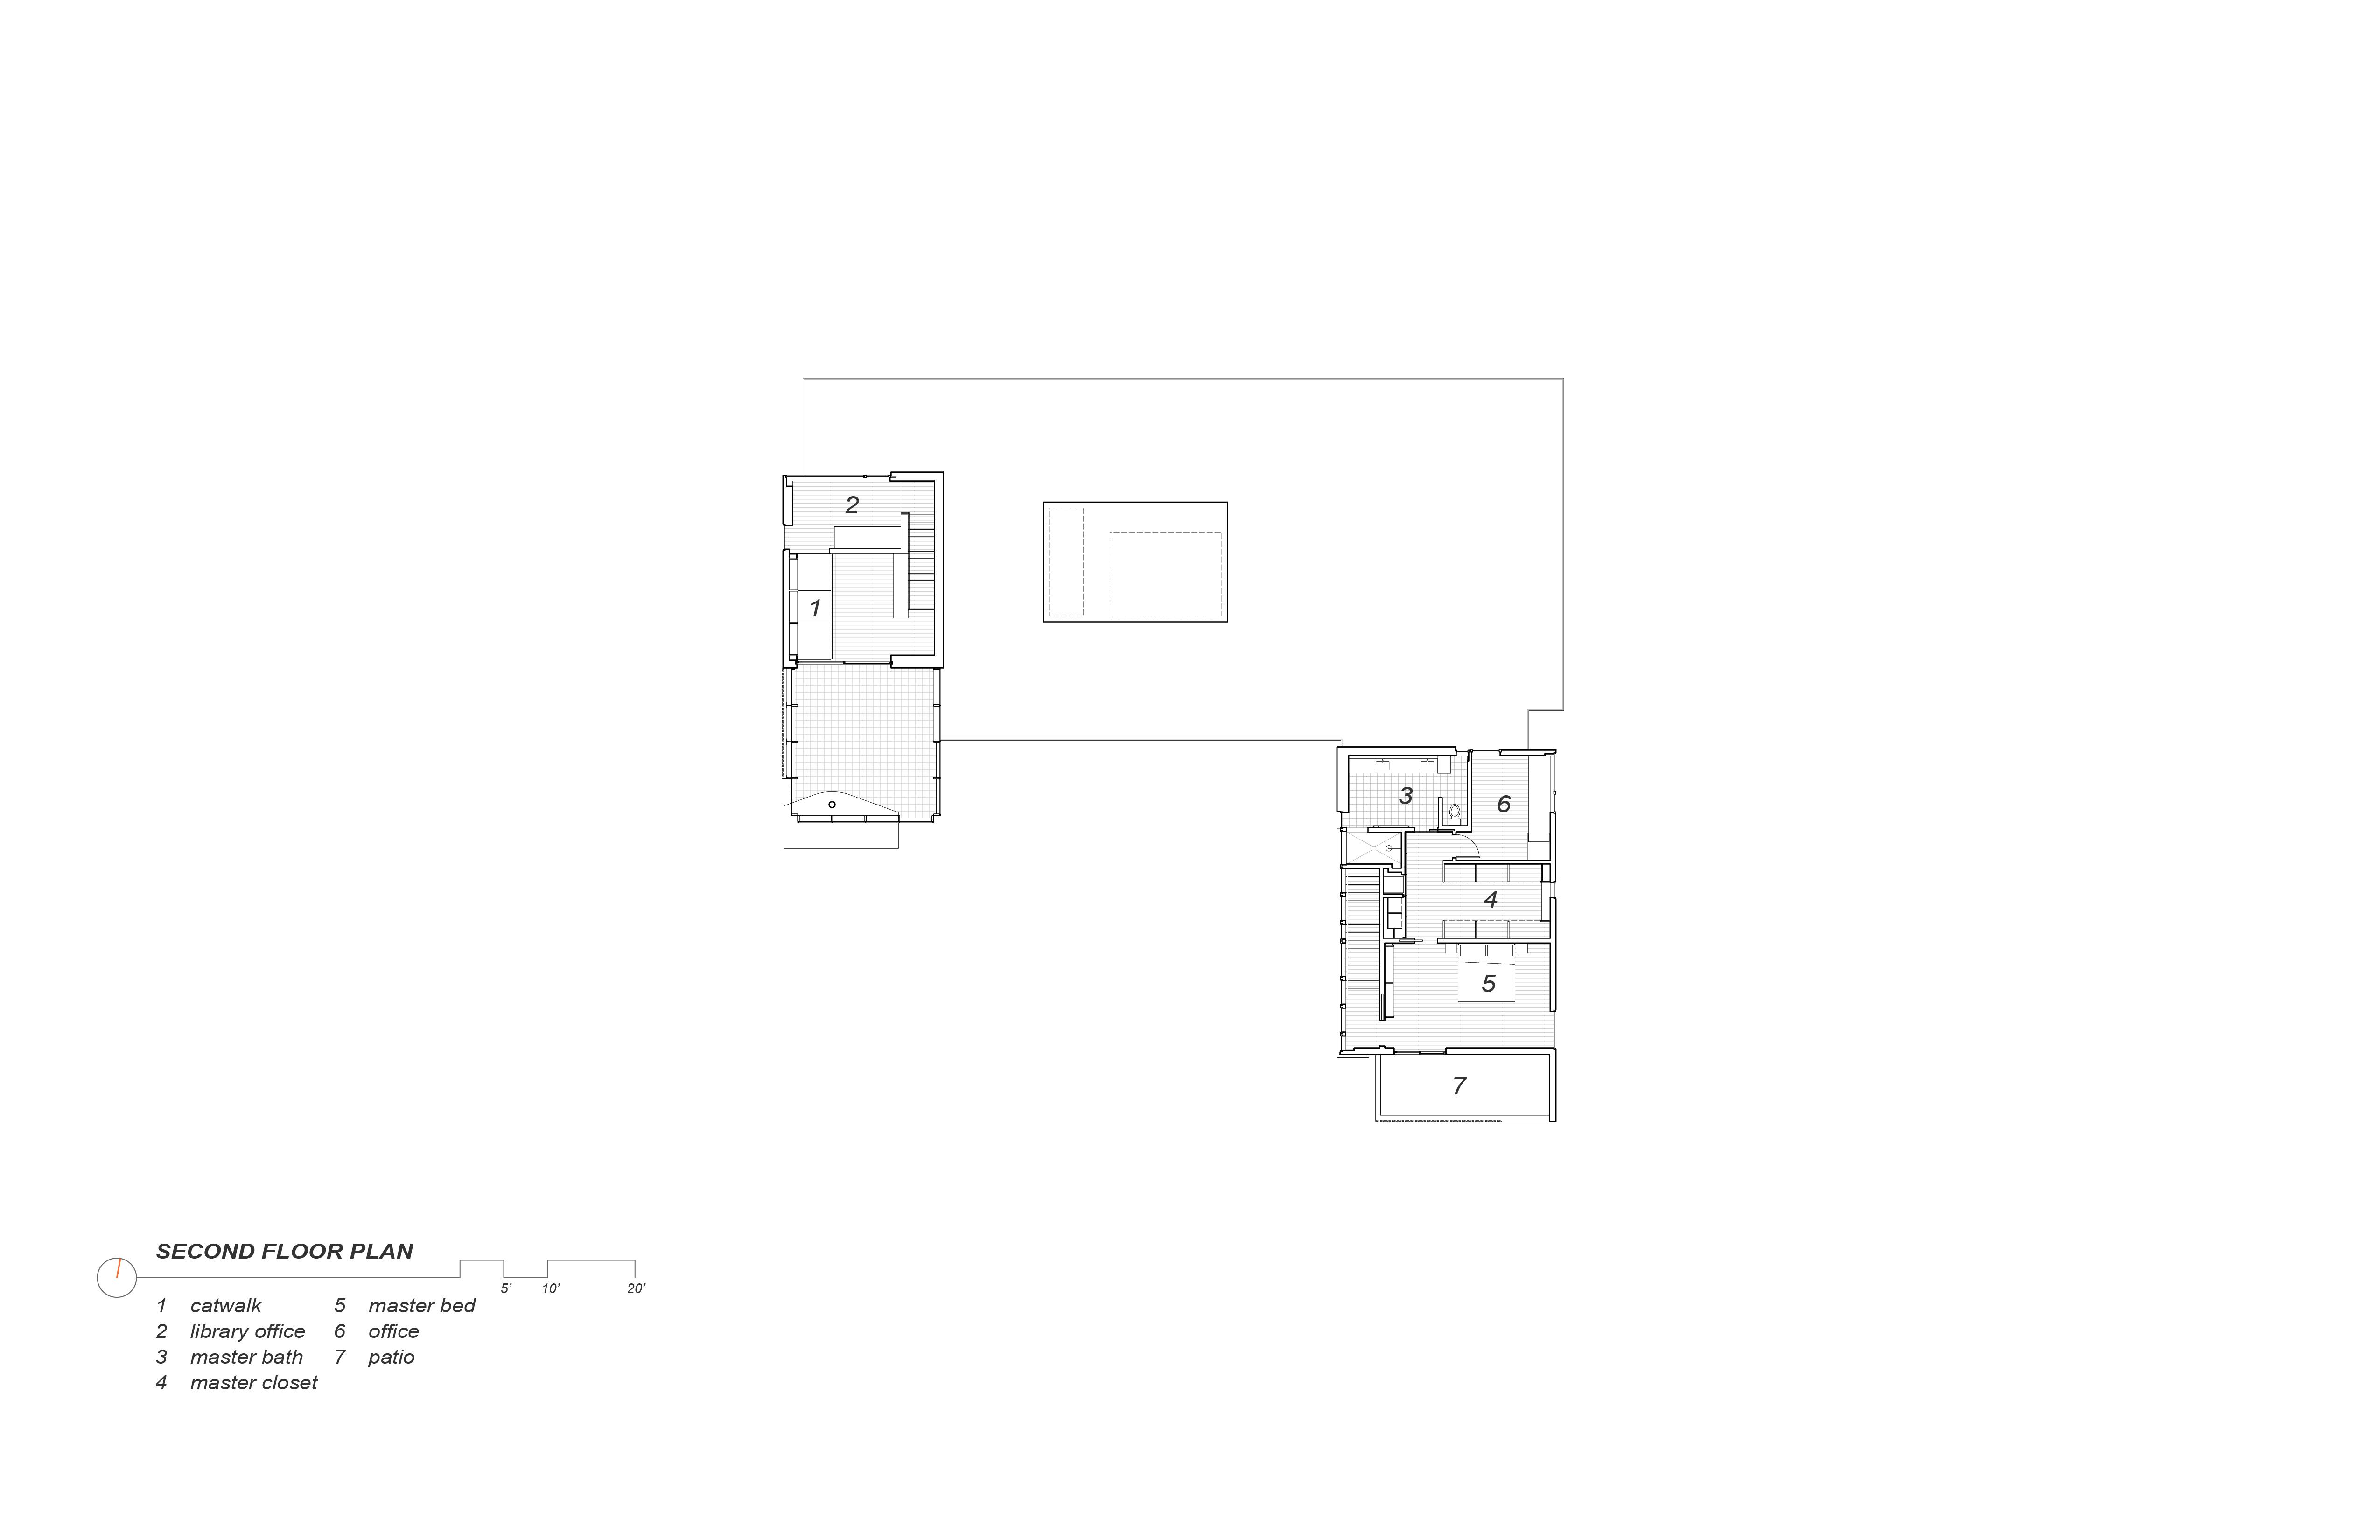 Second Floor Plan Alterstudio Architecture}